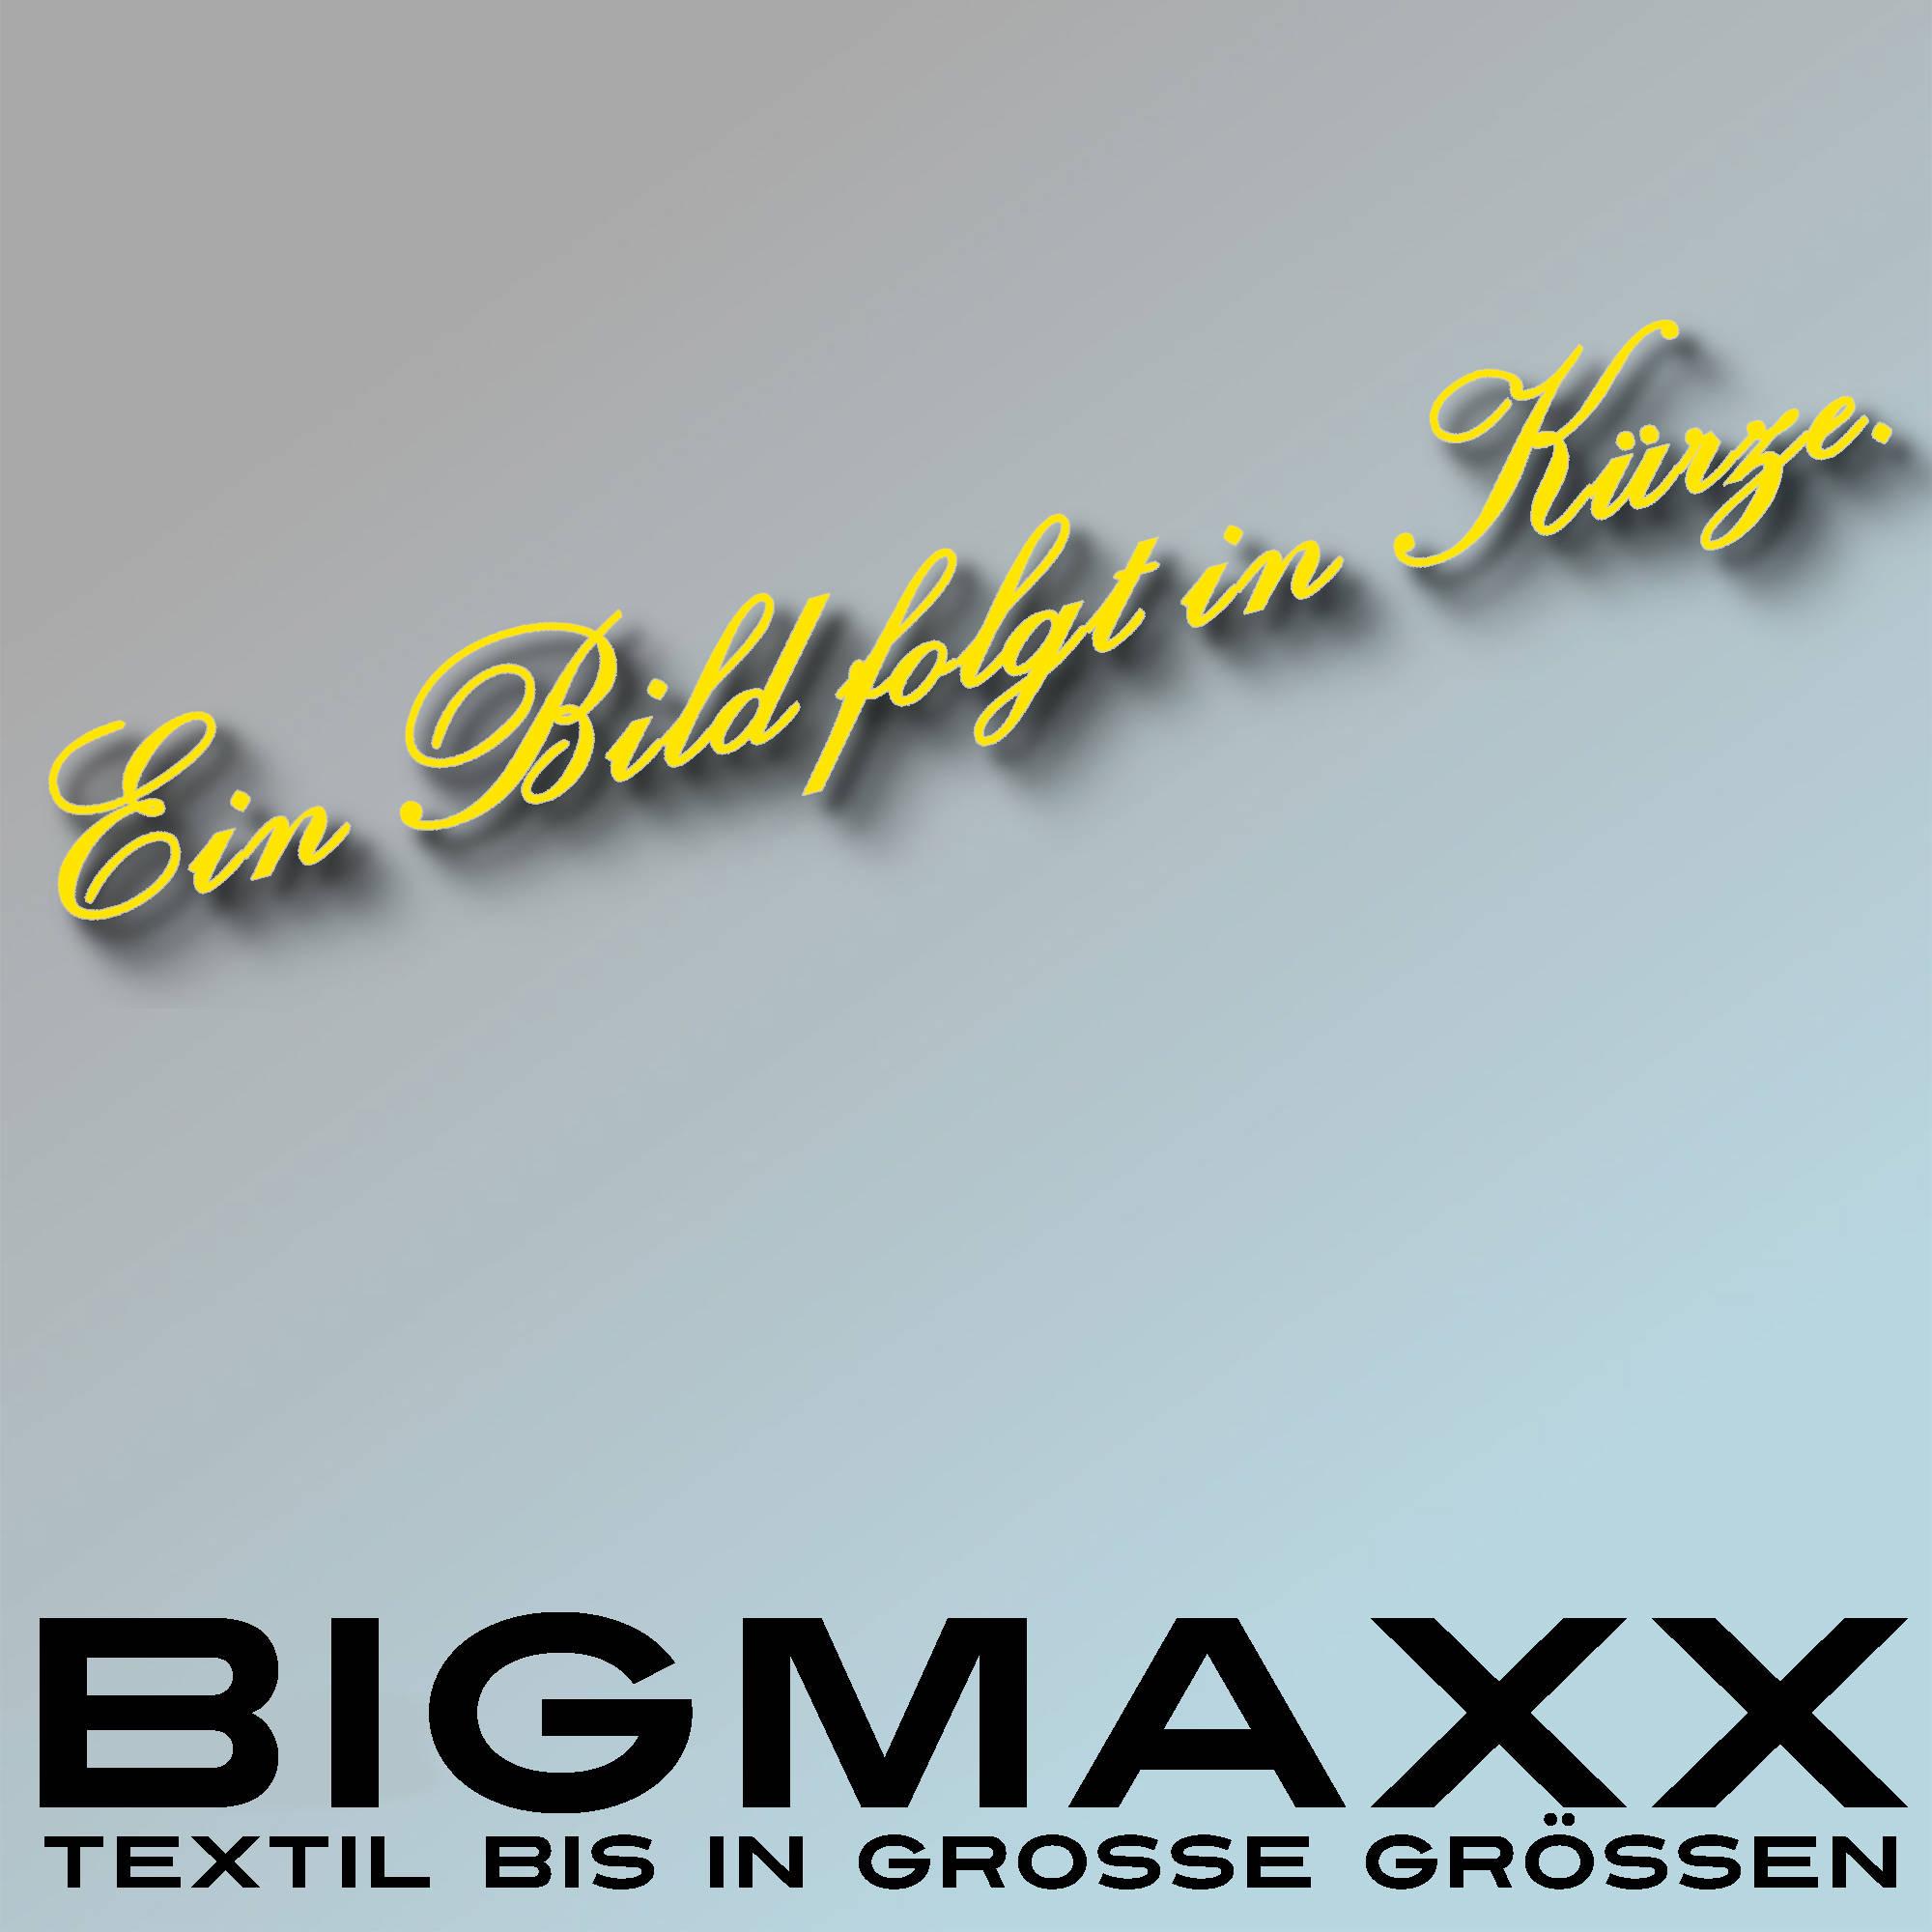 teXXor Warnweste Sicherheitswarnweste gem EN 471 gelb leuchtgelb